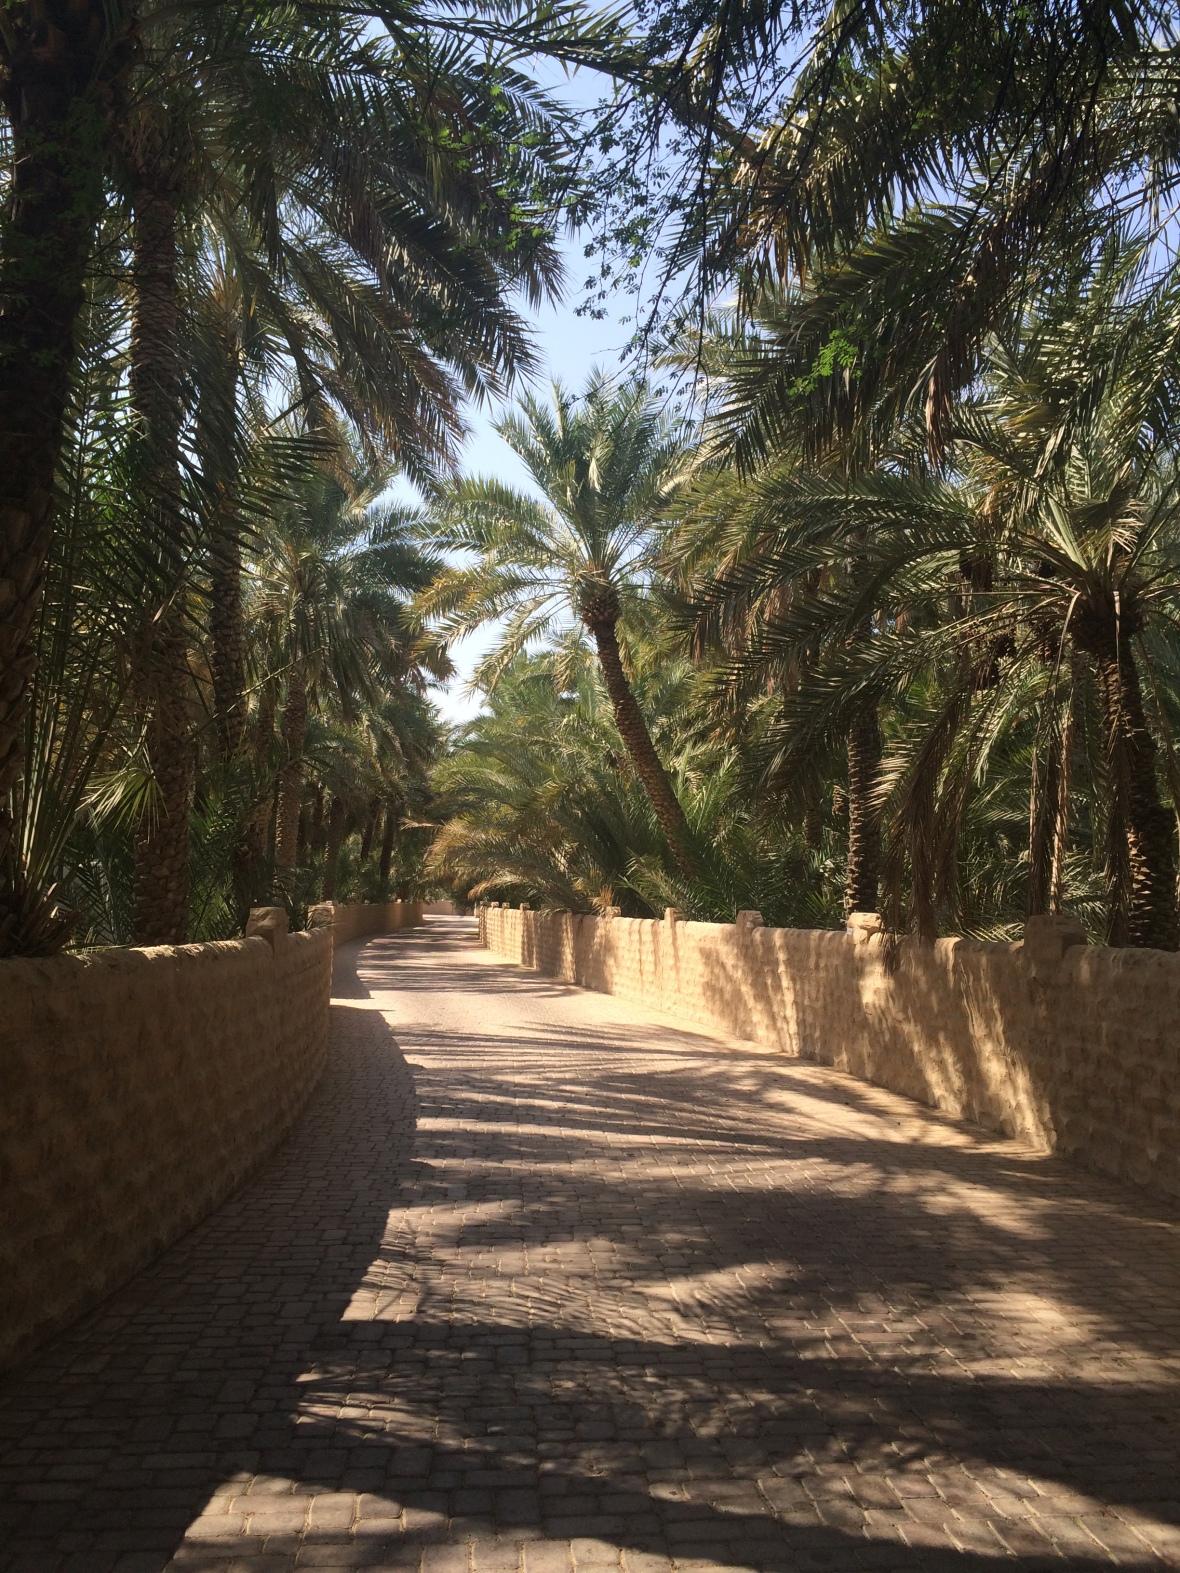 Pathway, Al Ain Oasis, Al Ain, UAE